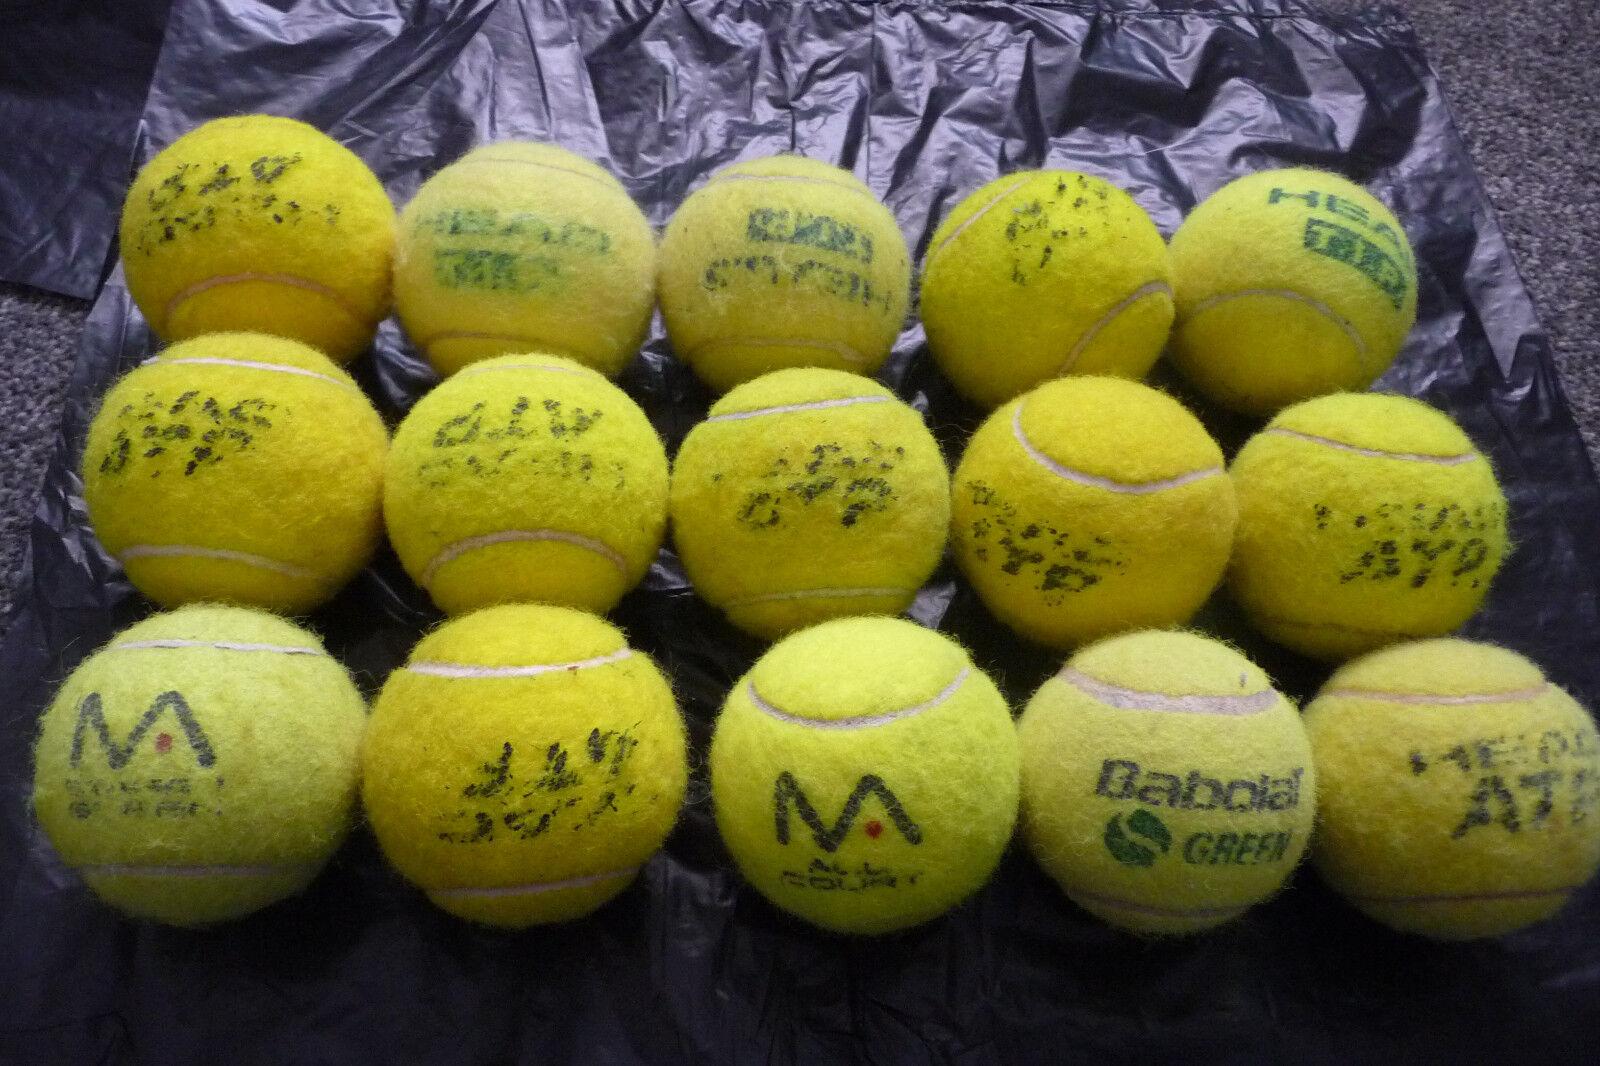 15 used tennis balls lot 9